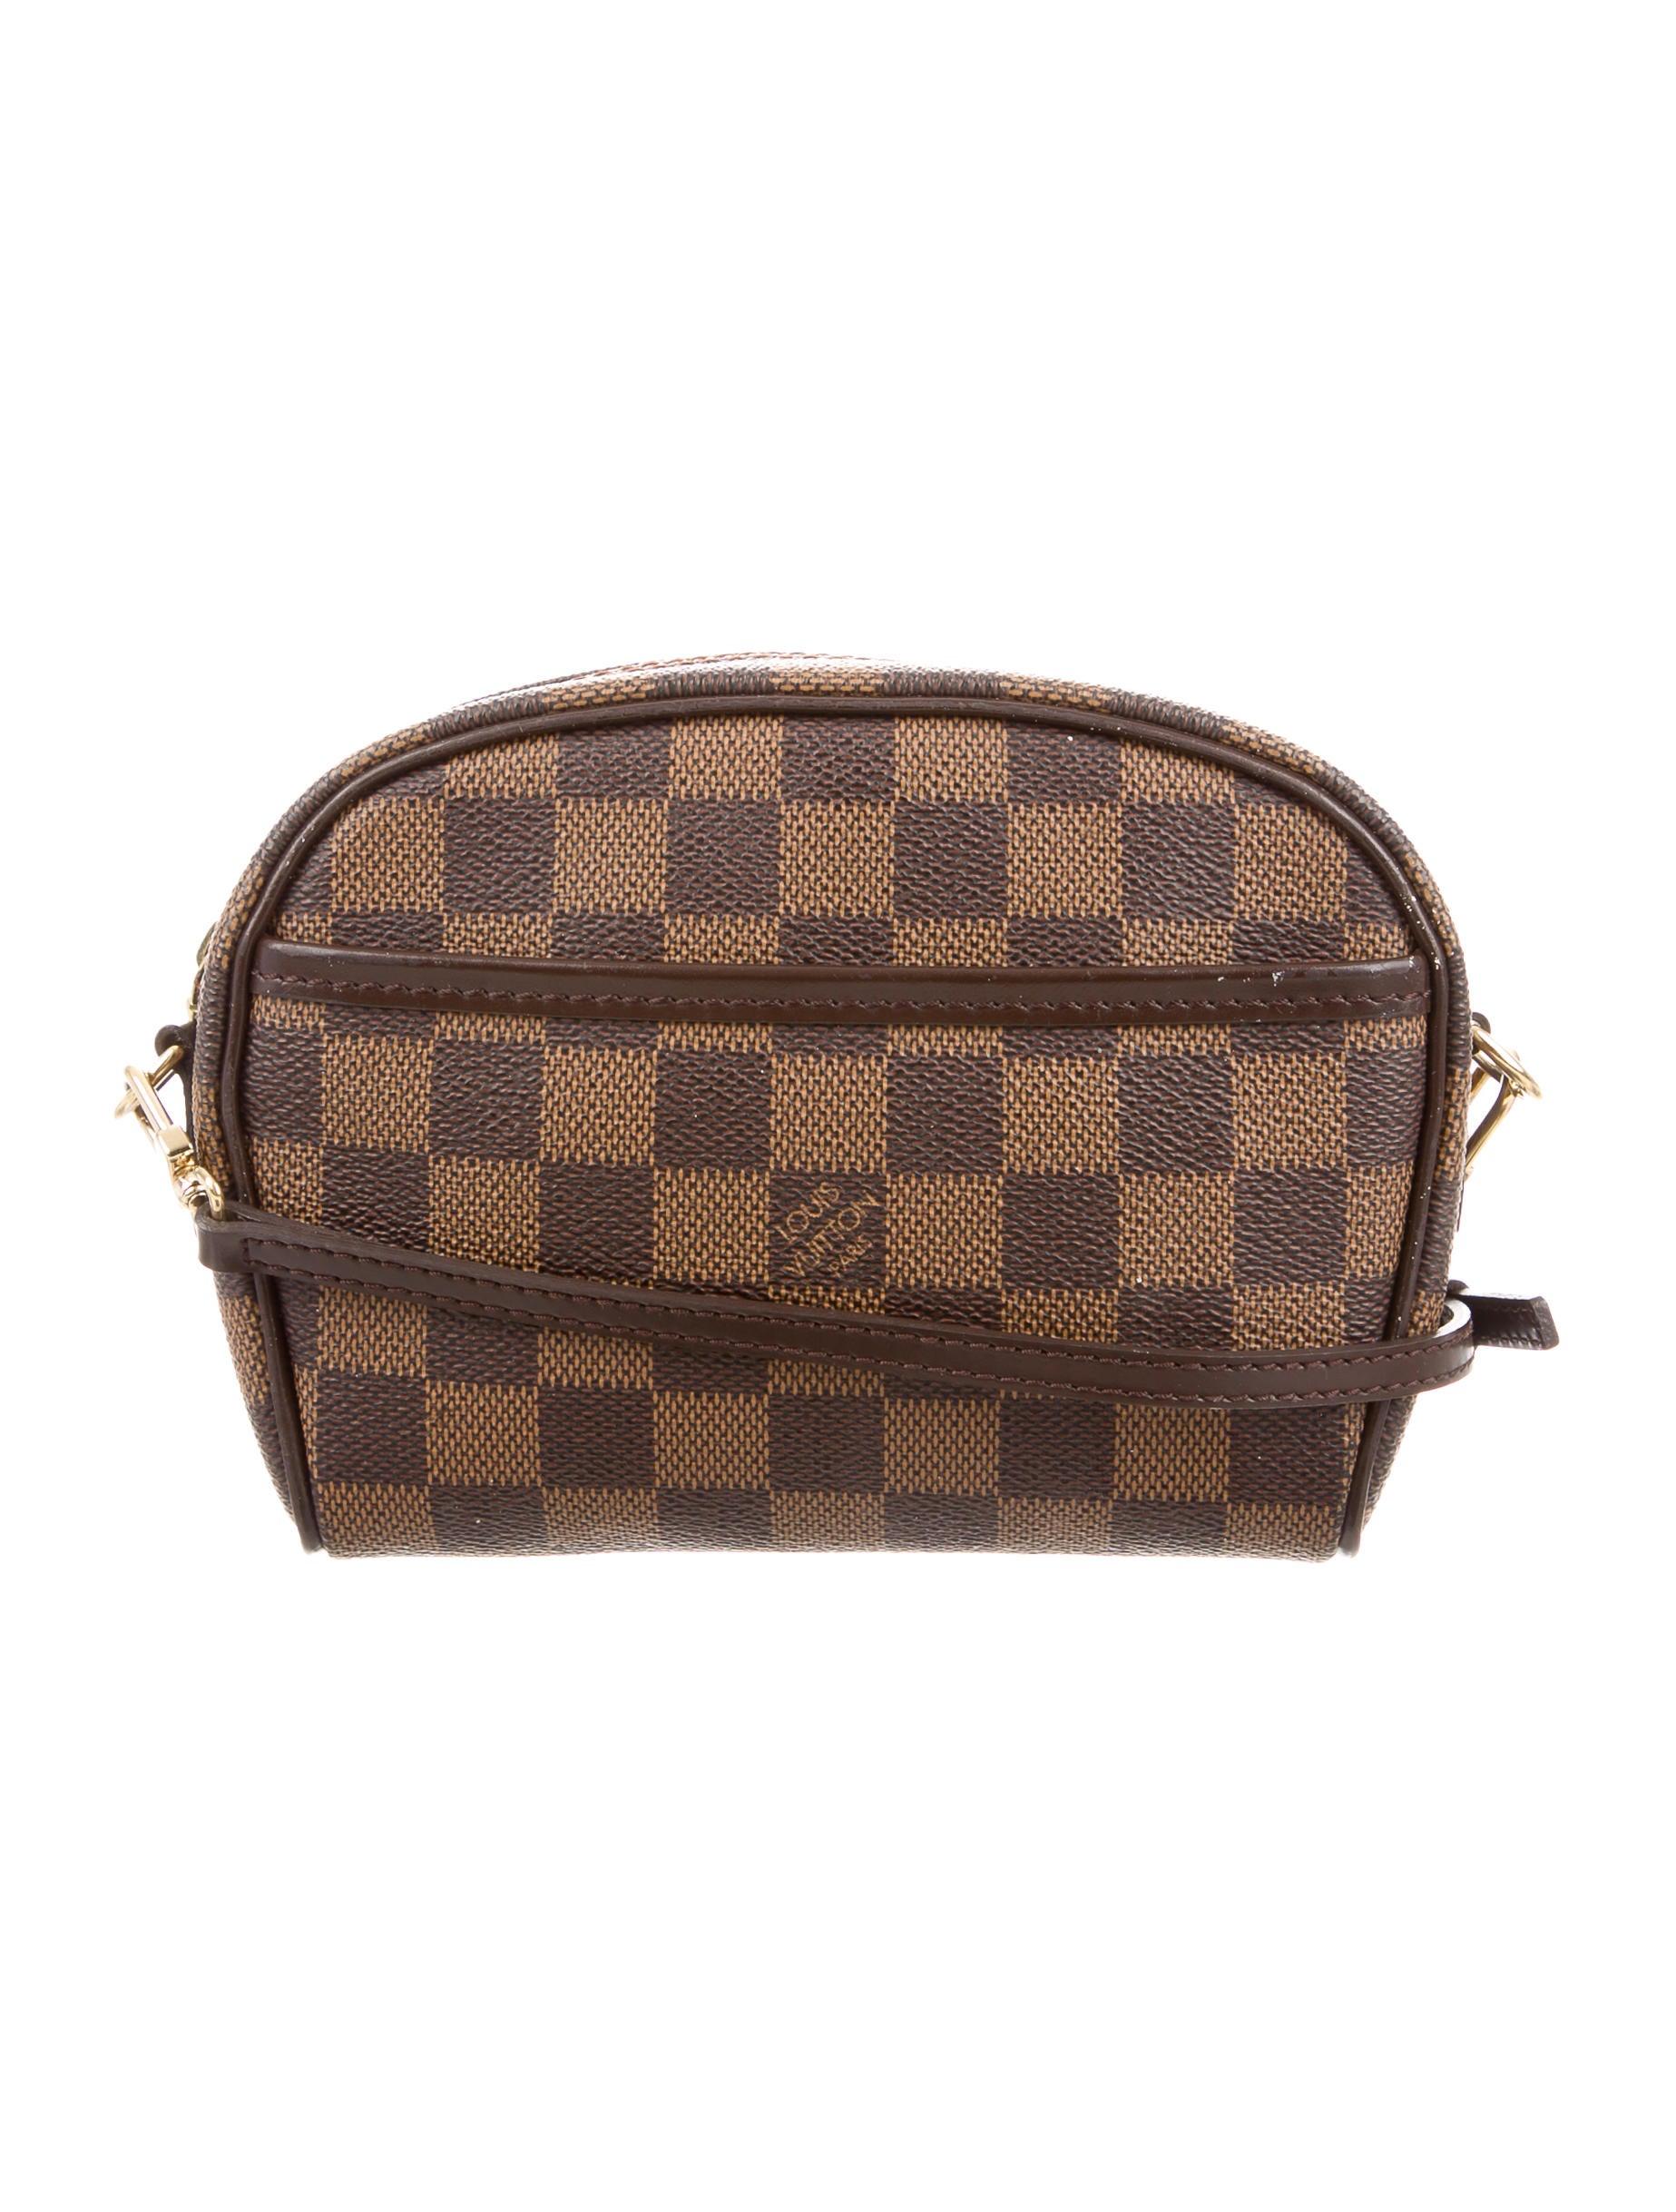 30804649f690 Louis Vuitton Damier Ebene Ipanema Pochette - Handbags - LOU106662 ...